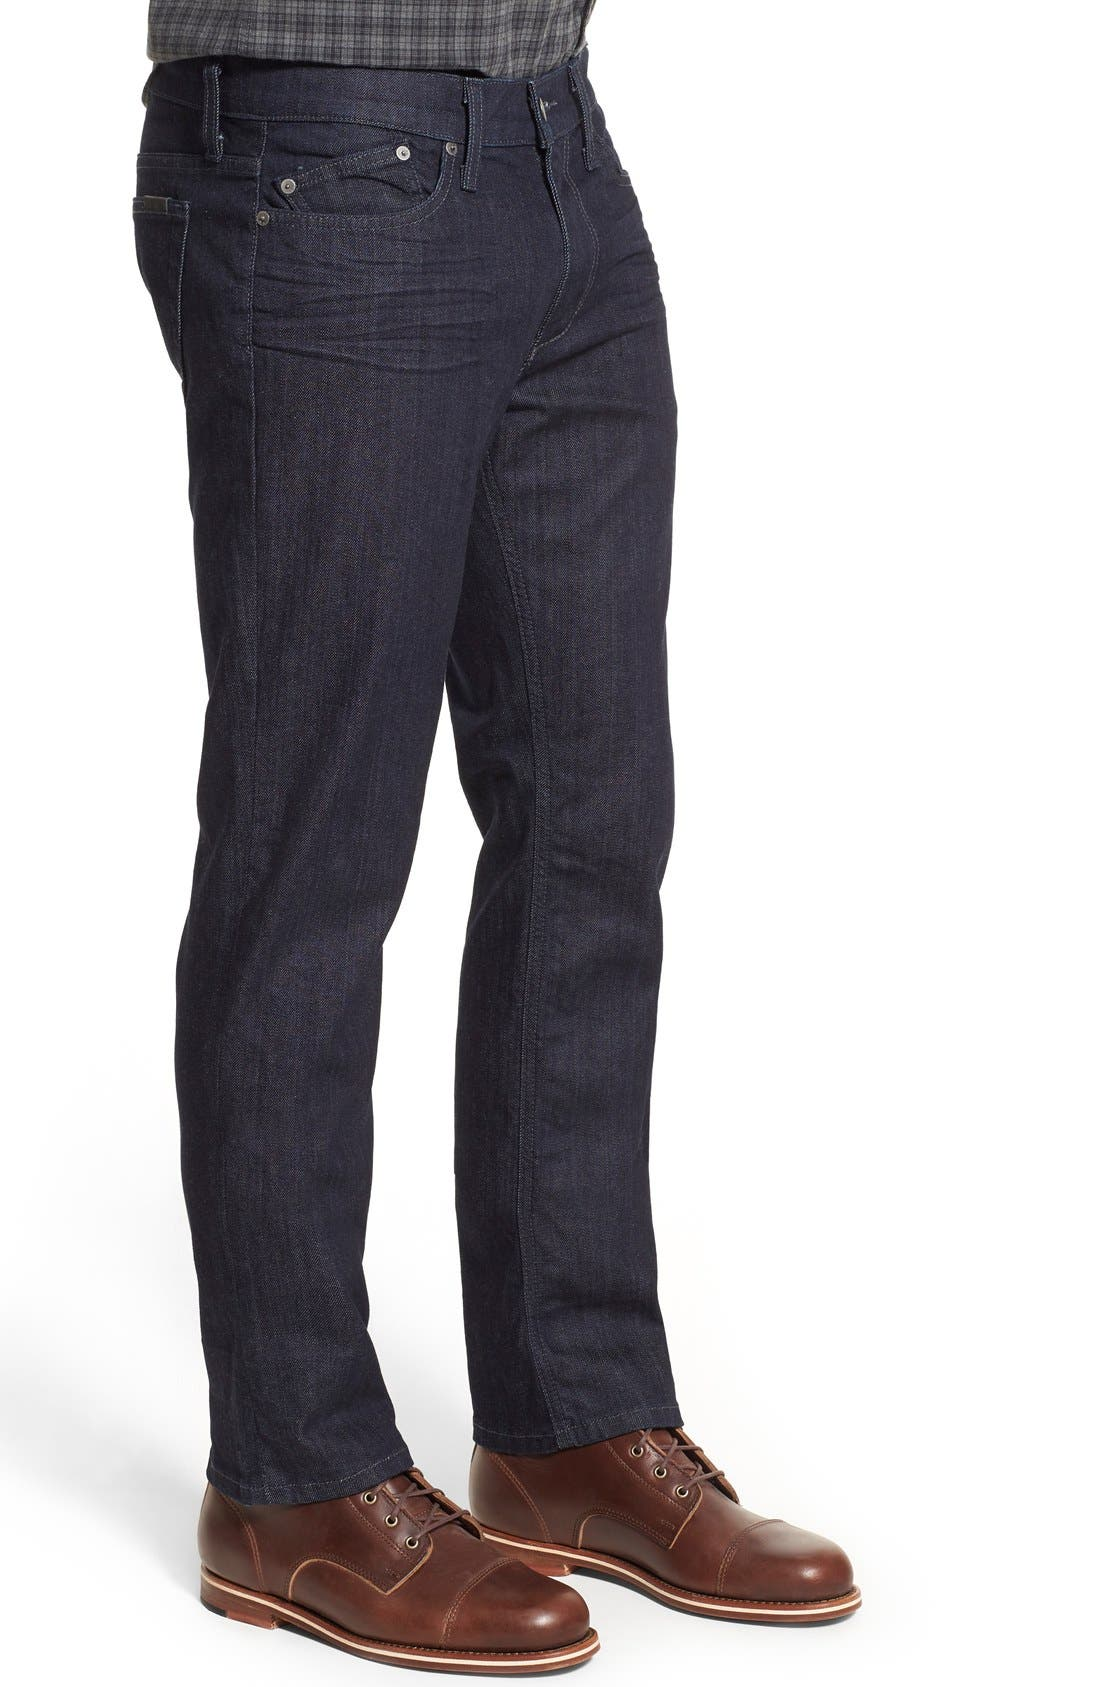 Brixton Slim Straight Fit Jeans,                             Alternate thumbnail 6, color,                             KING